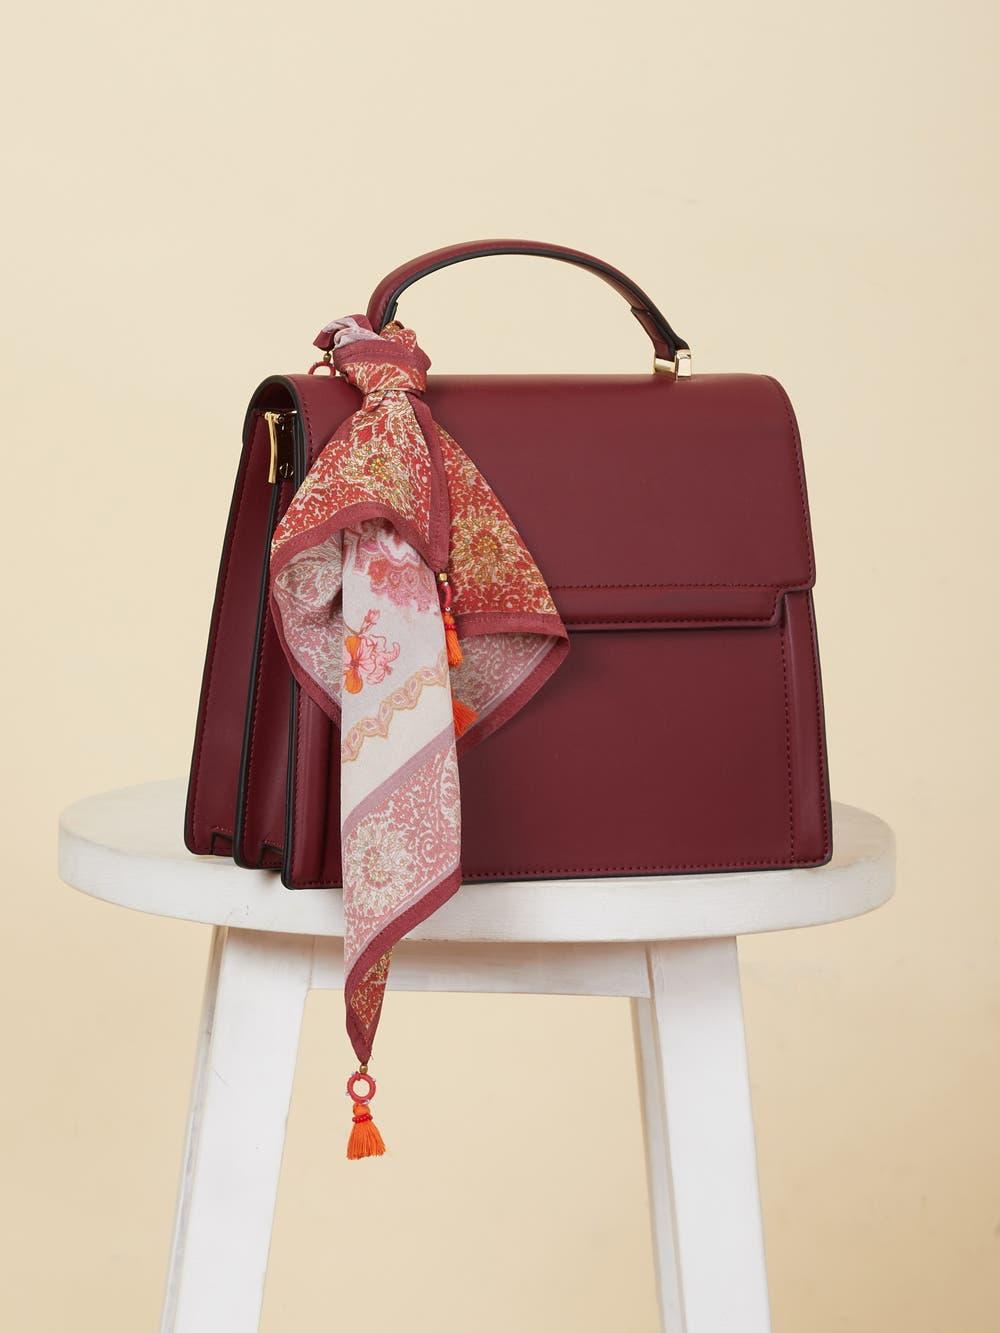 Burgundy Sling Bag with Scarf